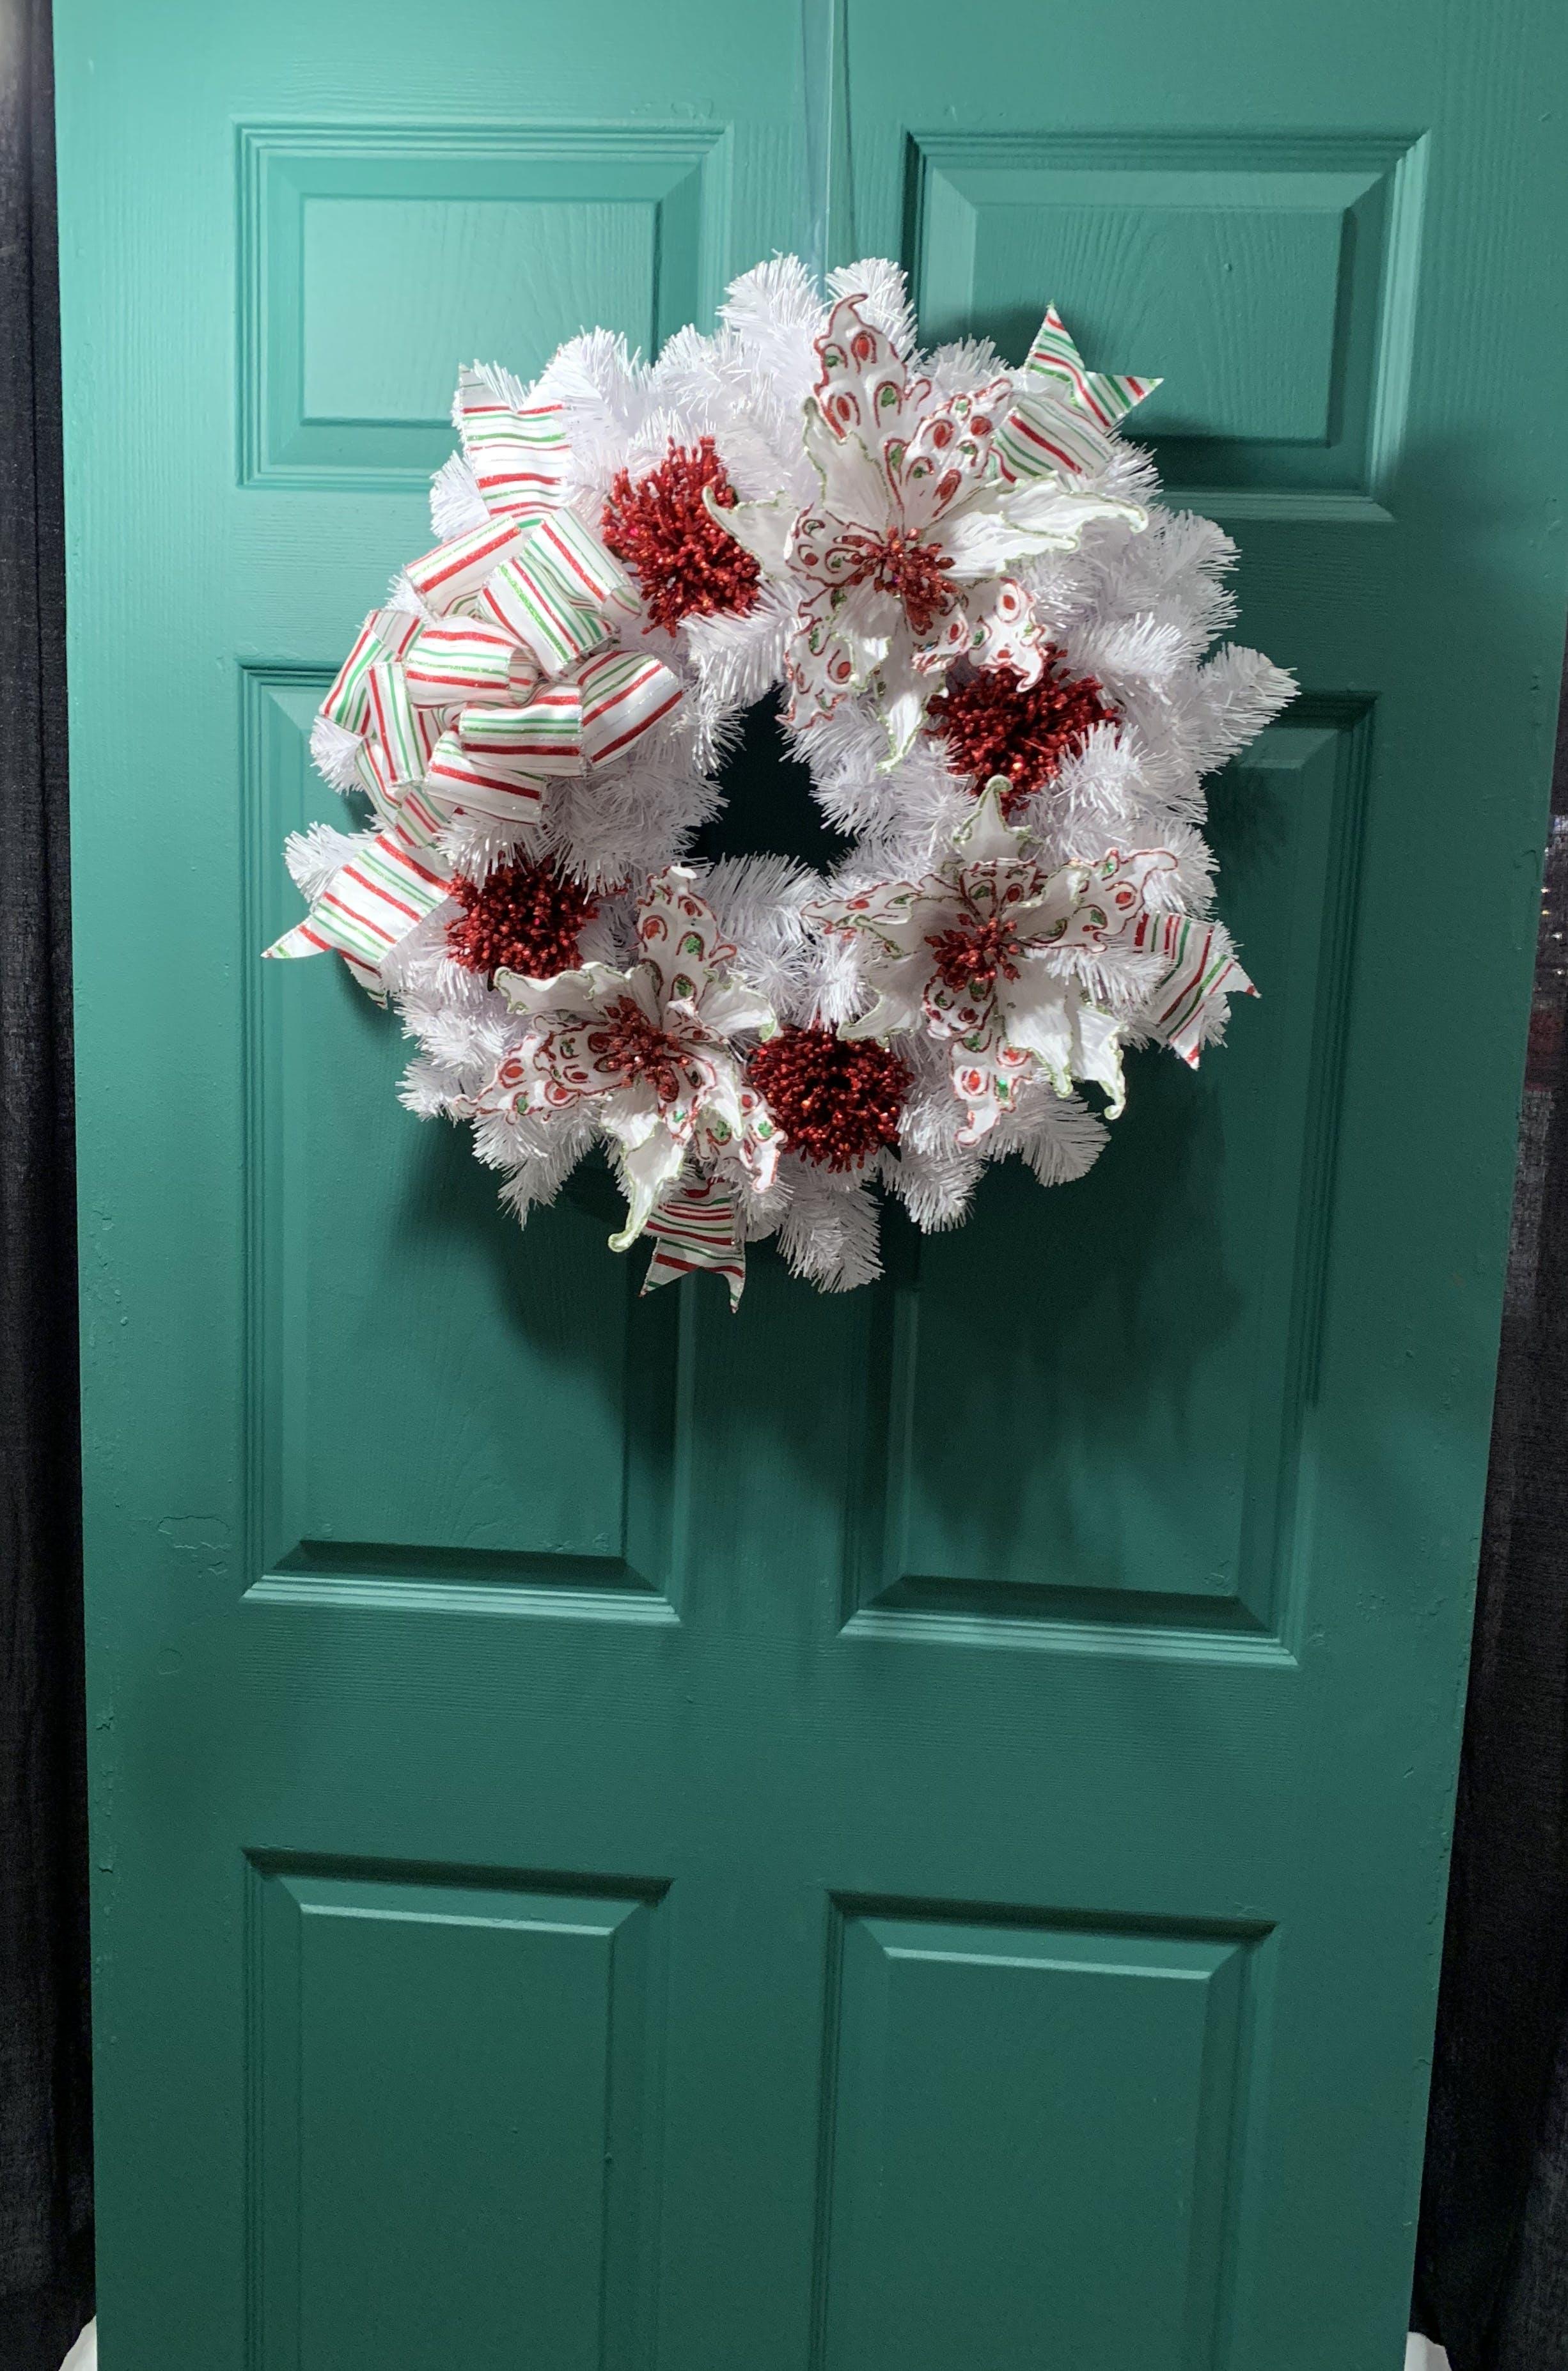 Free stock photo of christmas decor, christmas decorations, wreath